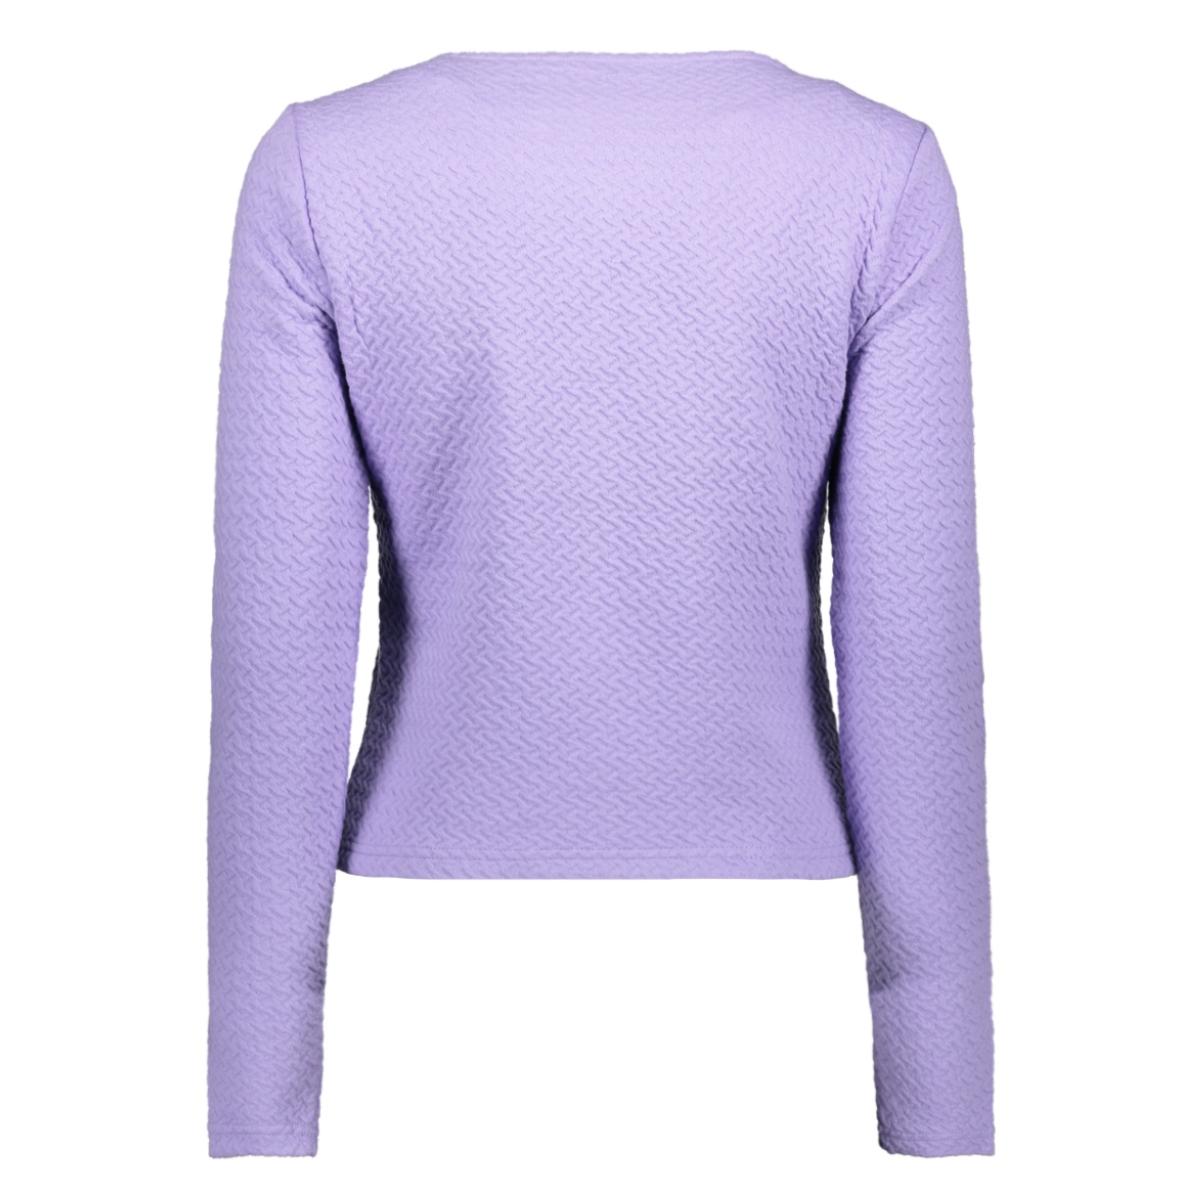 vinaja new short jacket-fav 14043895 vila vest violet tulip